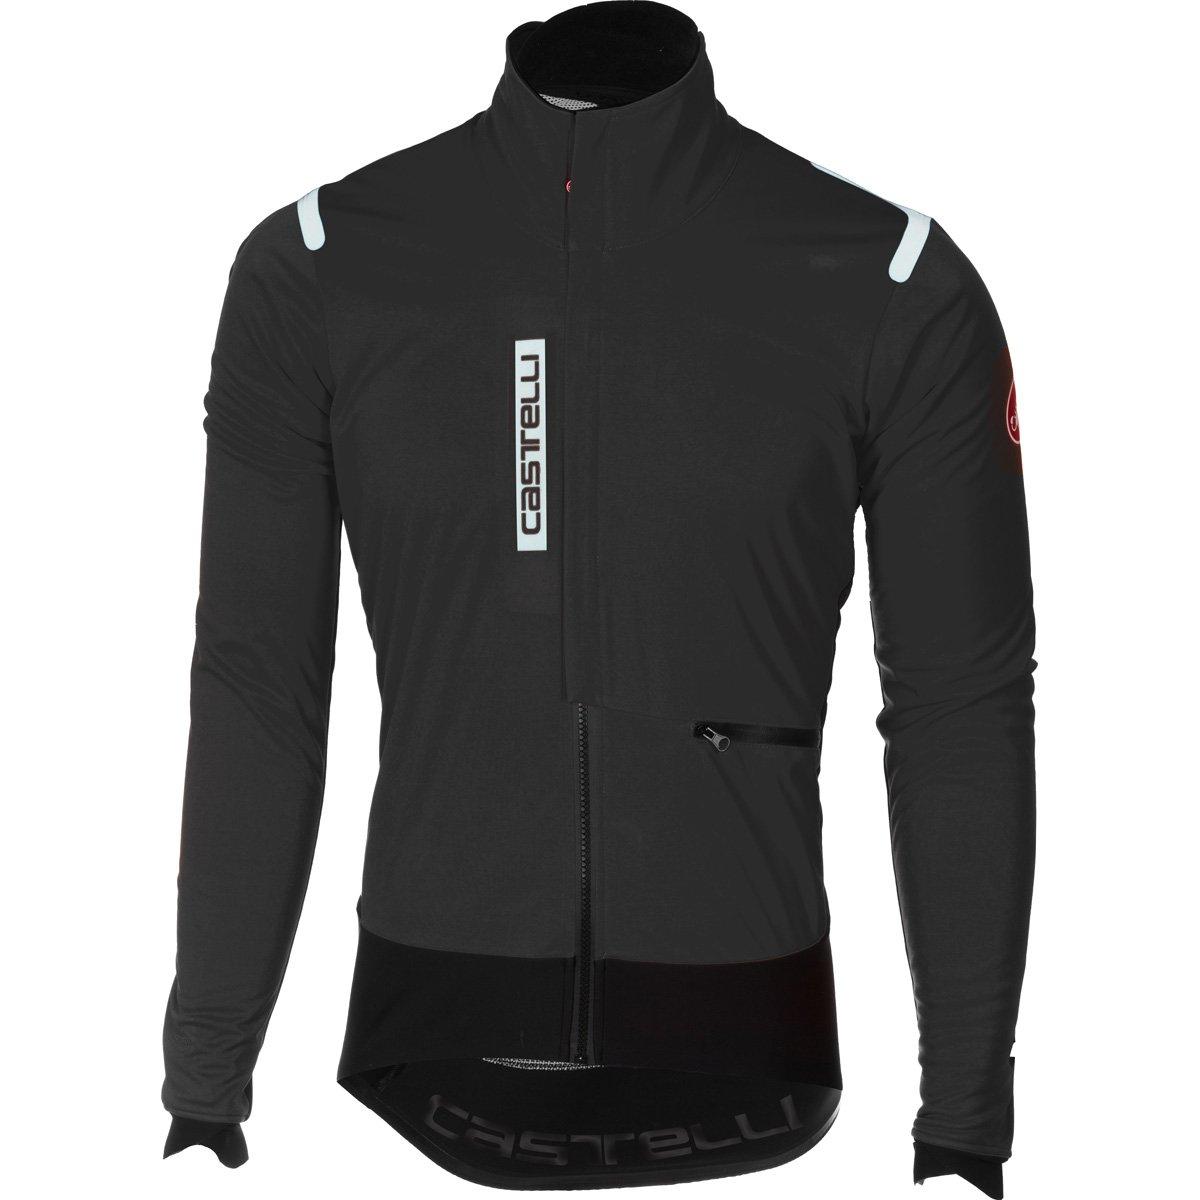 Castelli 2017 / 18 Men 'sアルファRosサイクリングジャケット – b17502 B075ZRHCPJ Medium|light black/black light black/black Medium